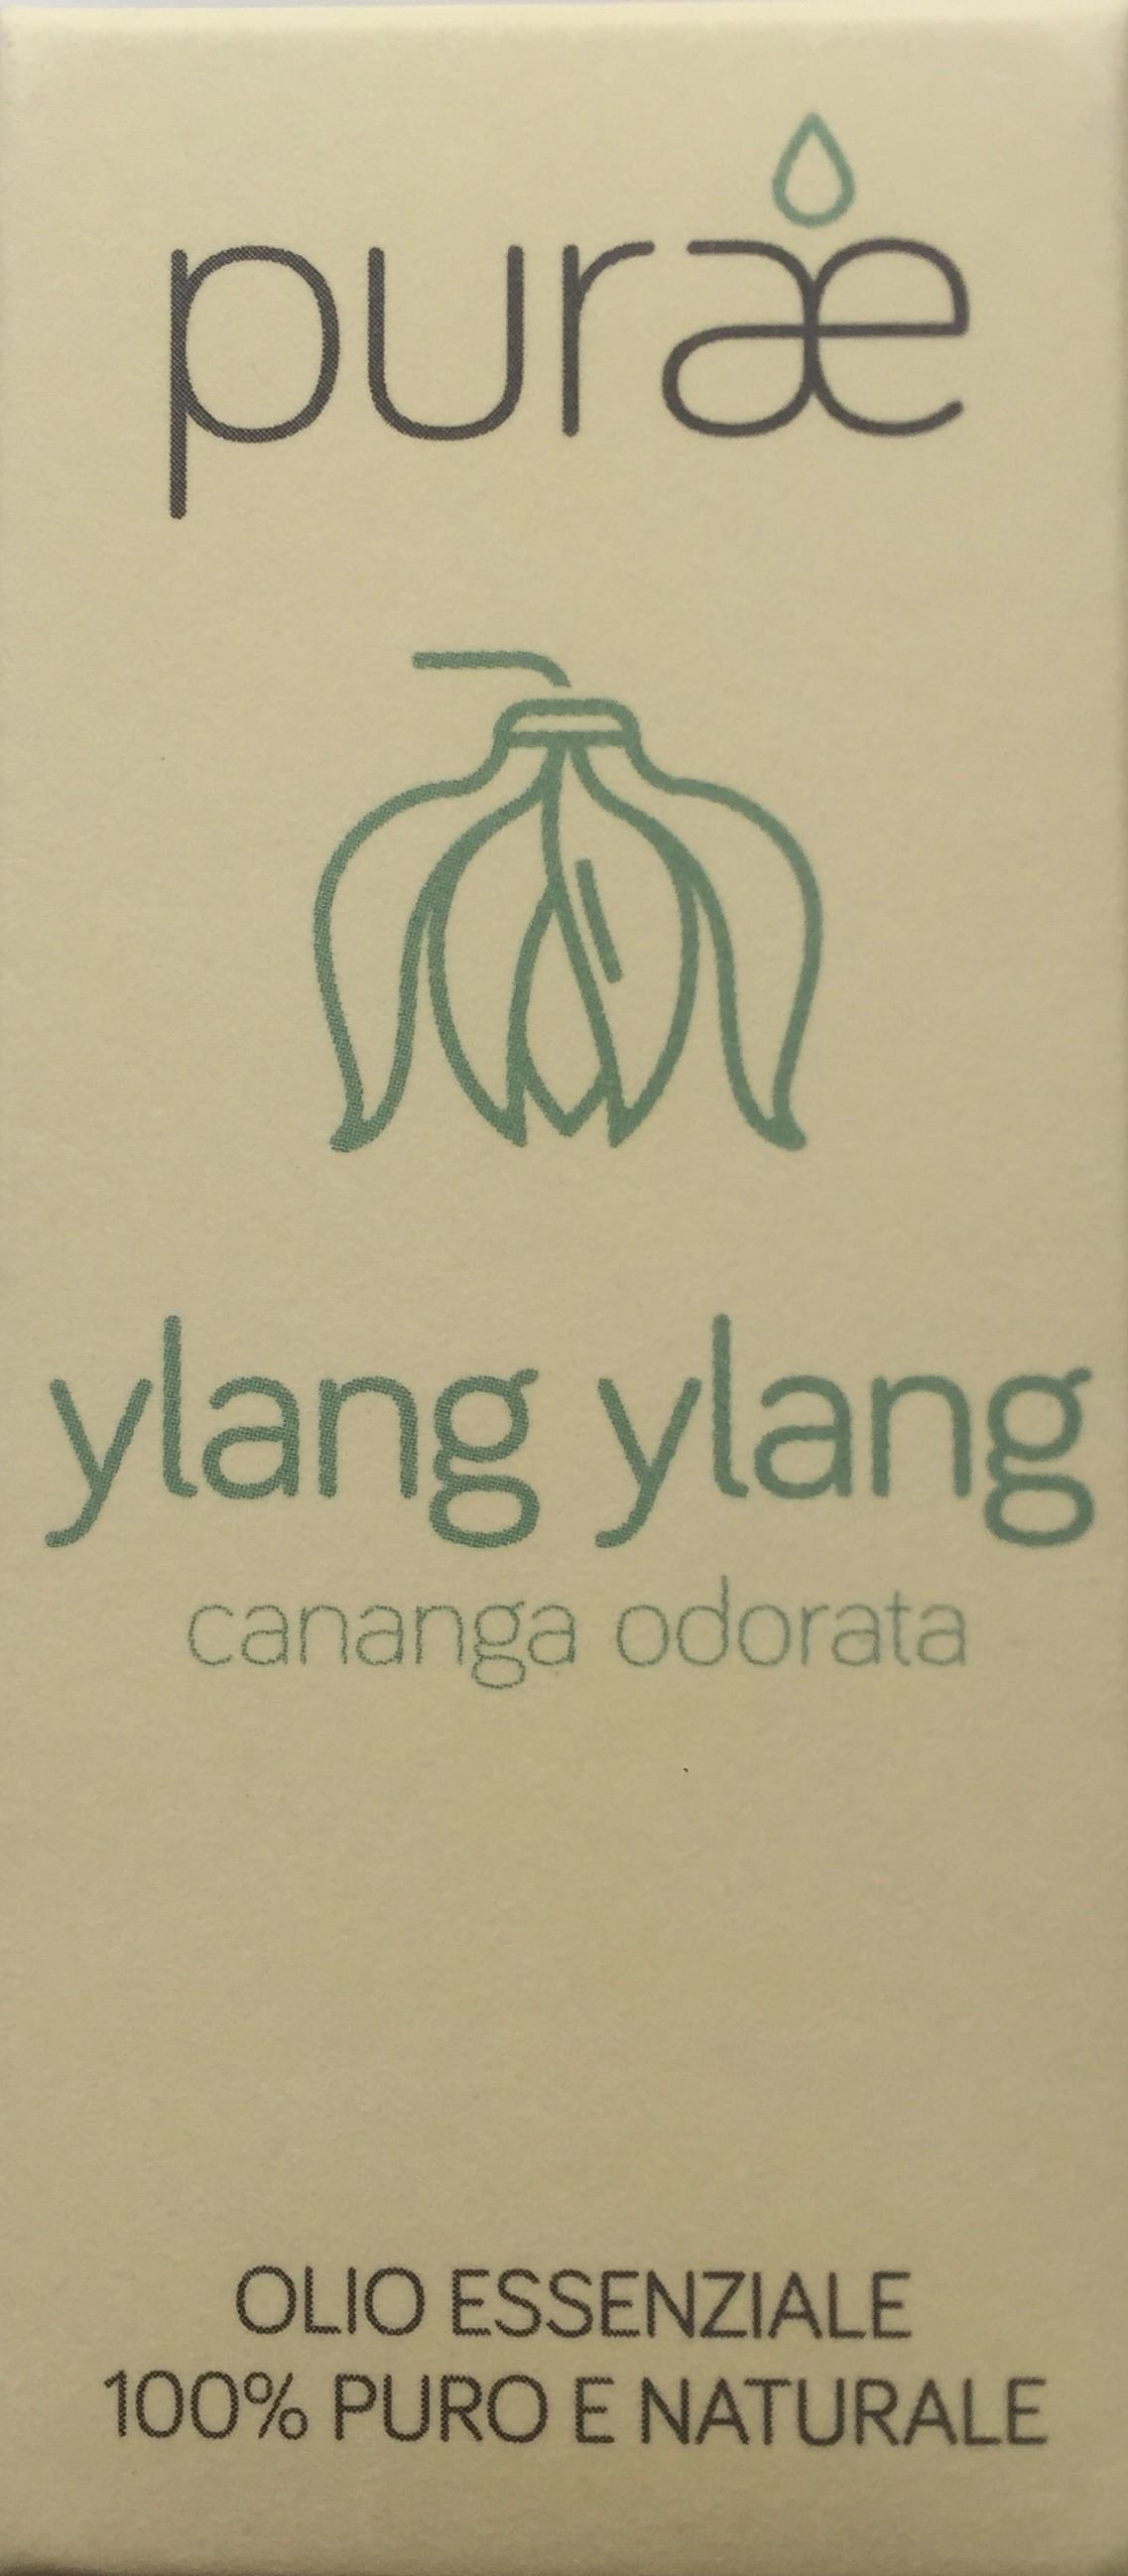 Purae Olio Essenziale Ylang Ylang 10ml